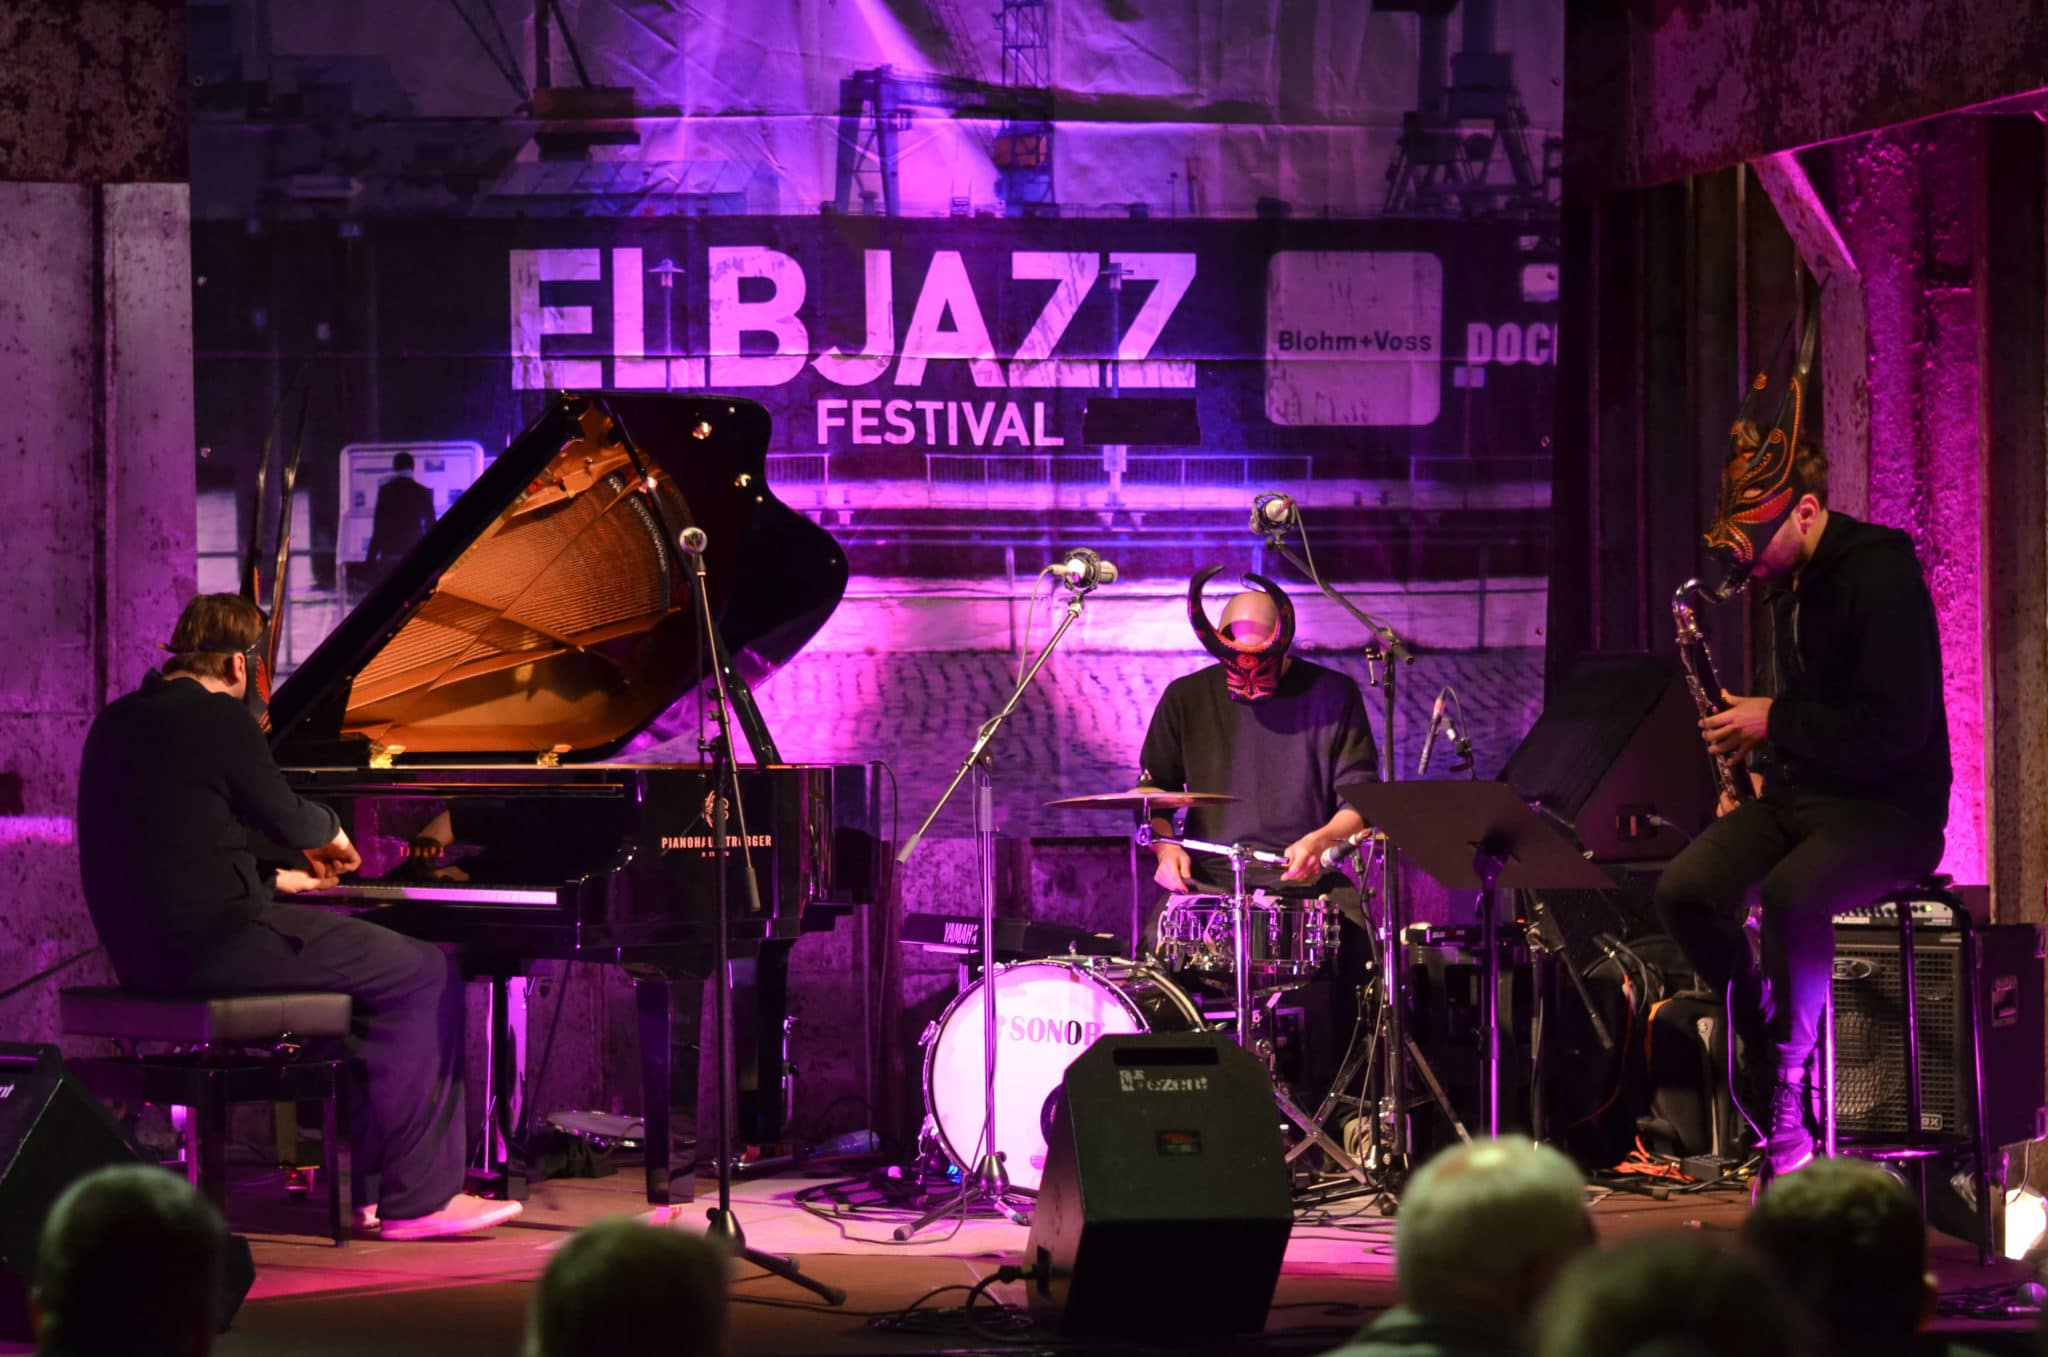 Elbjazz Festival macht 2016 Pause